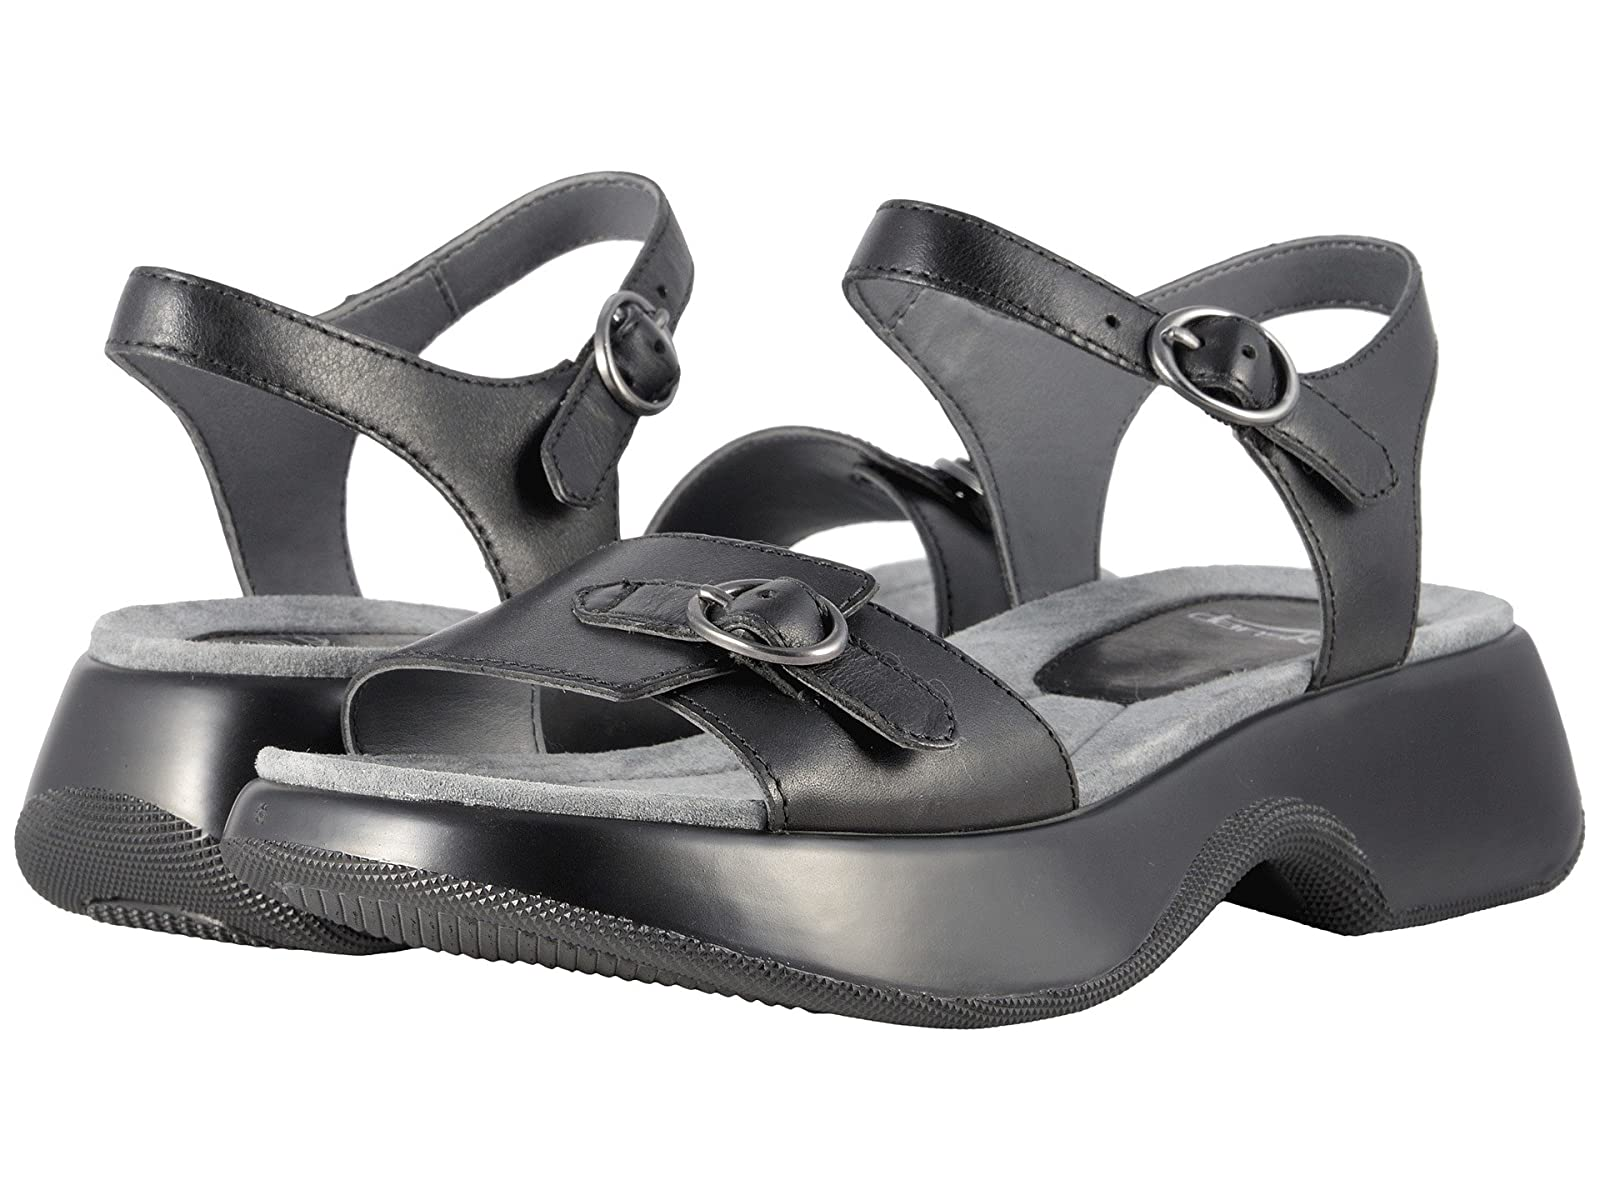 Dansko LynnieCheap and distinctive eye-catching shoes